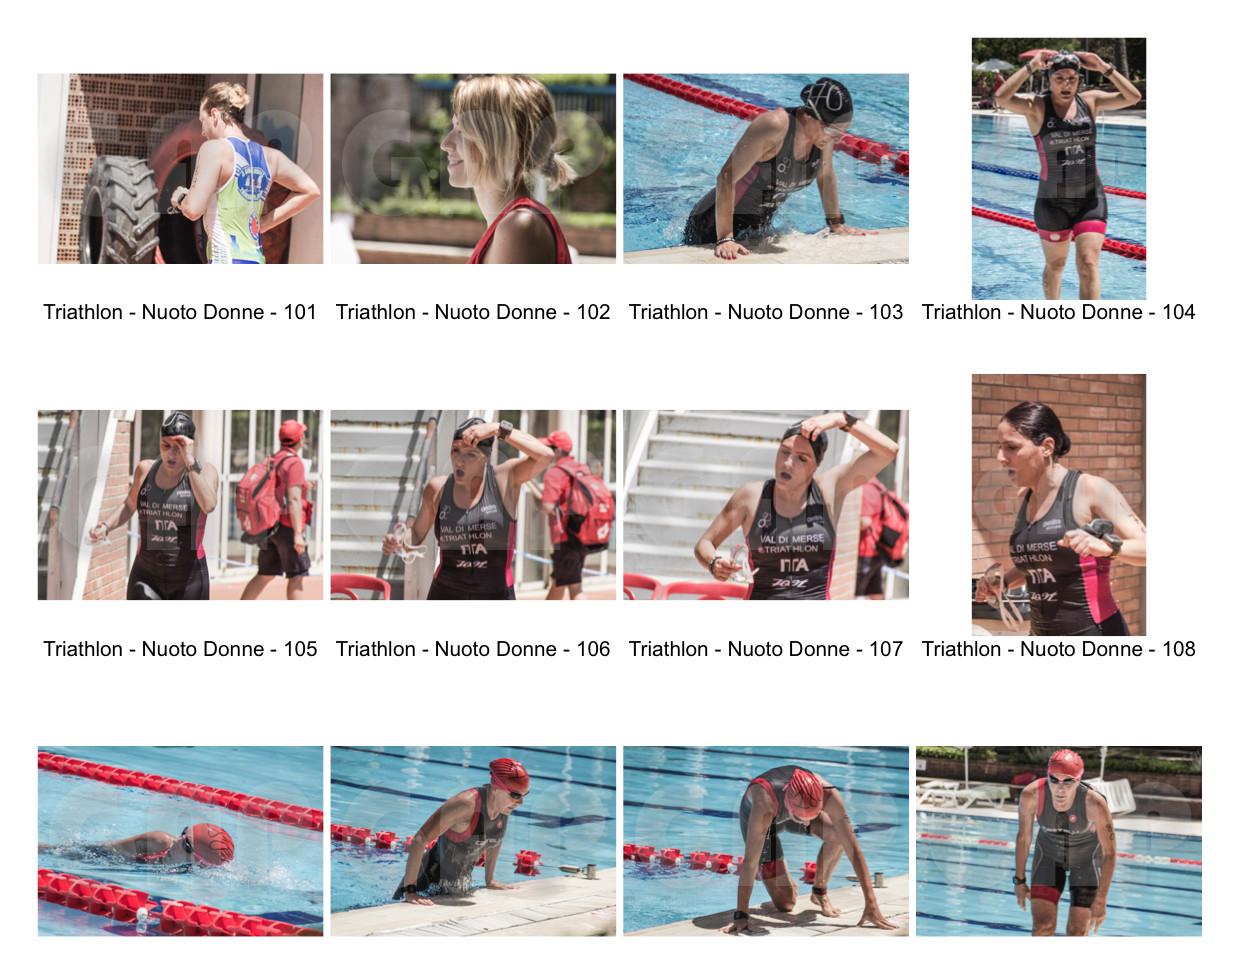 Triathlon V.Elsa - Nuoto Donne-6.jpg